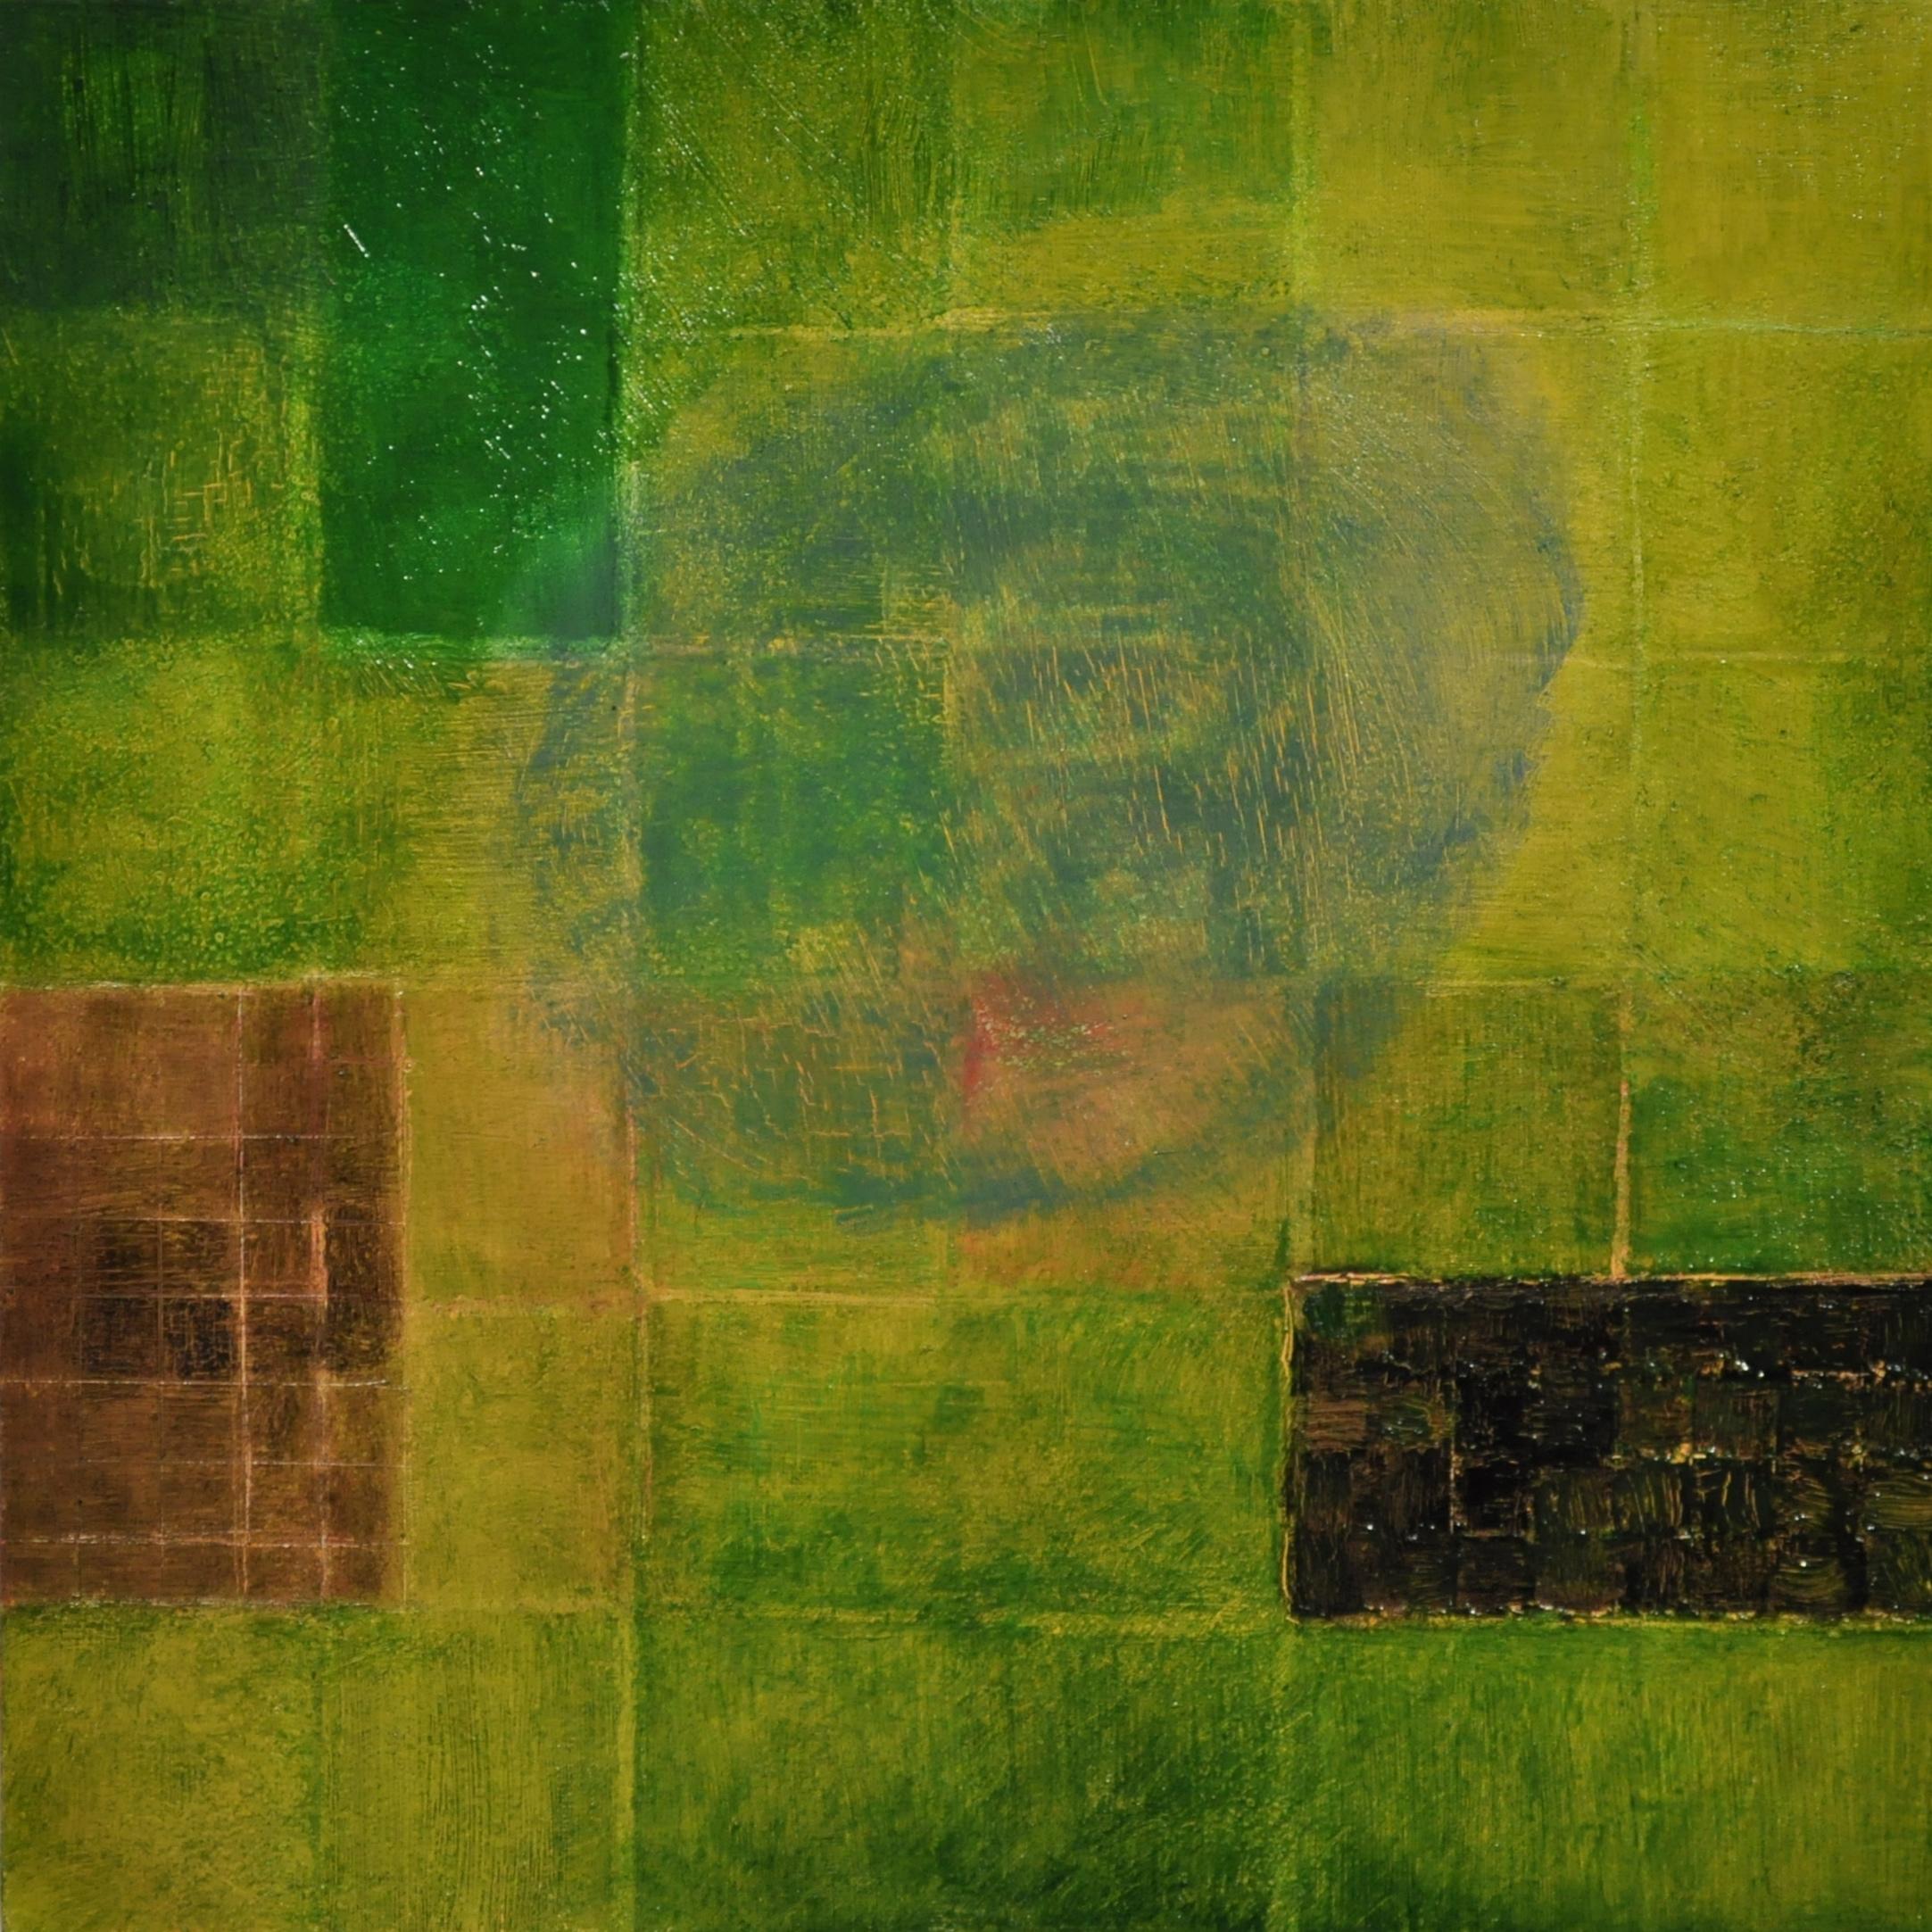 over mound, 2017 oil on wood panel, 15.2 x 15.2 cm